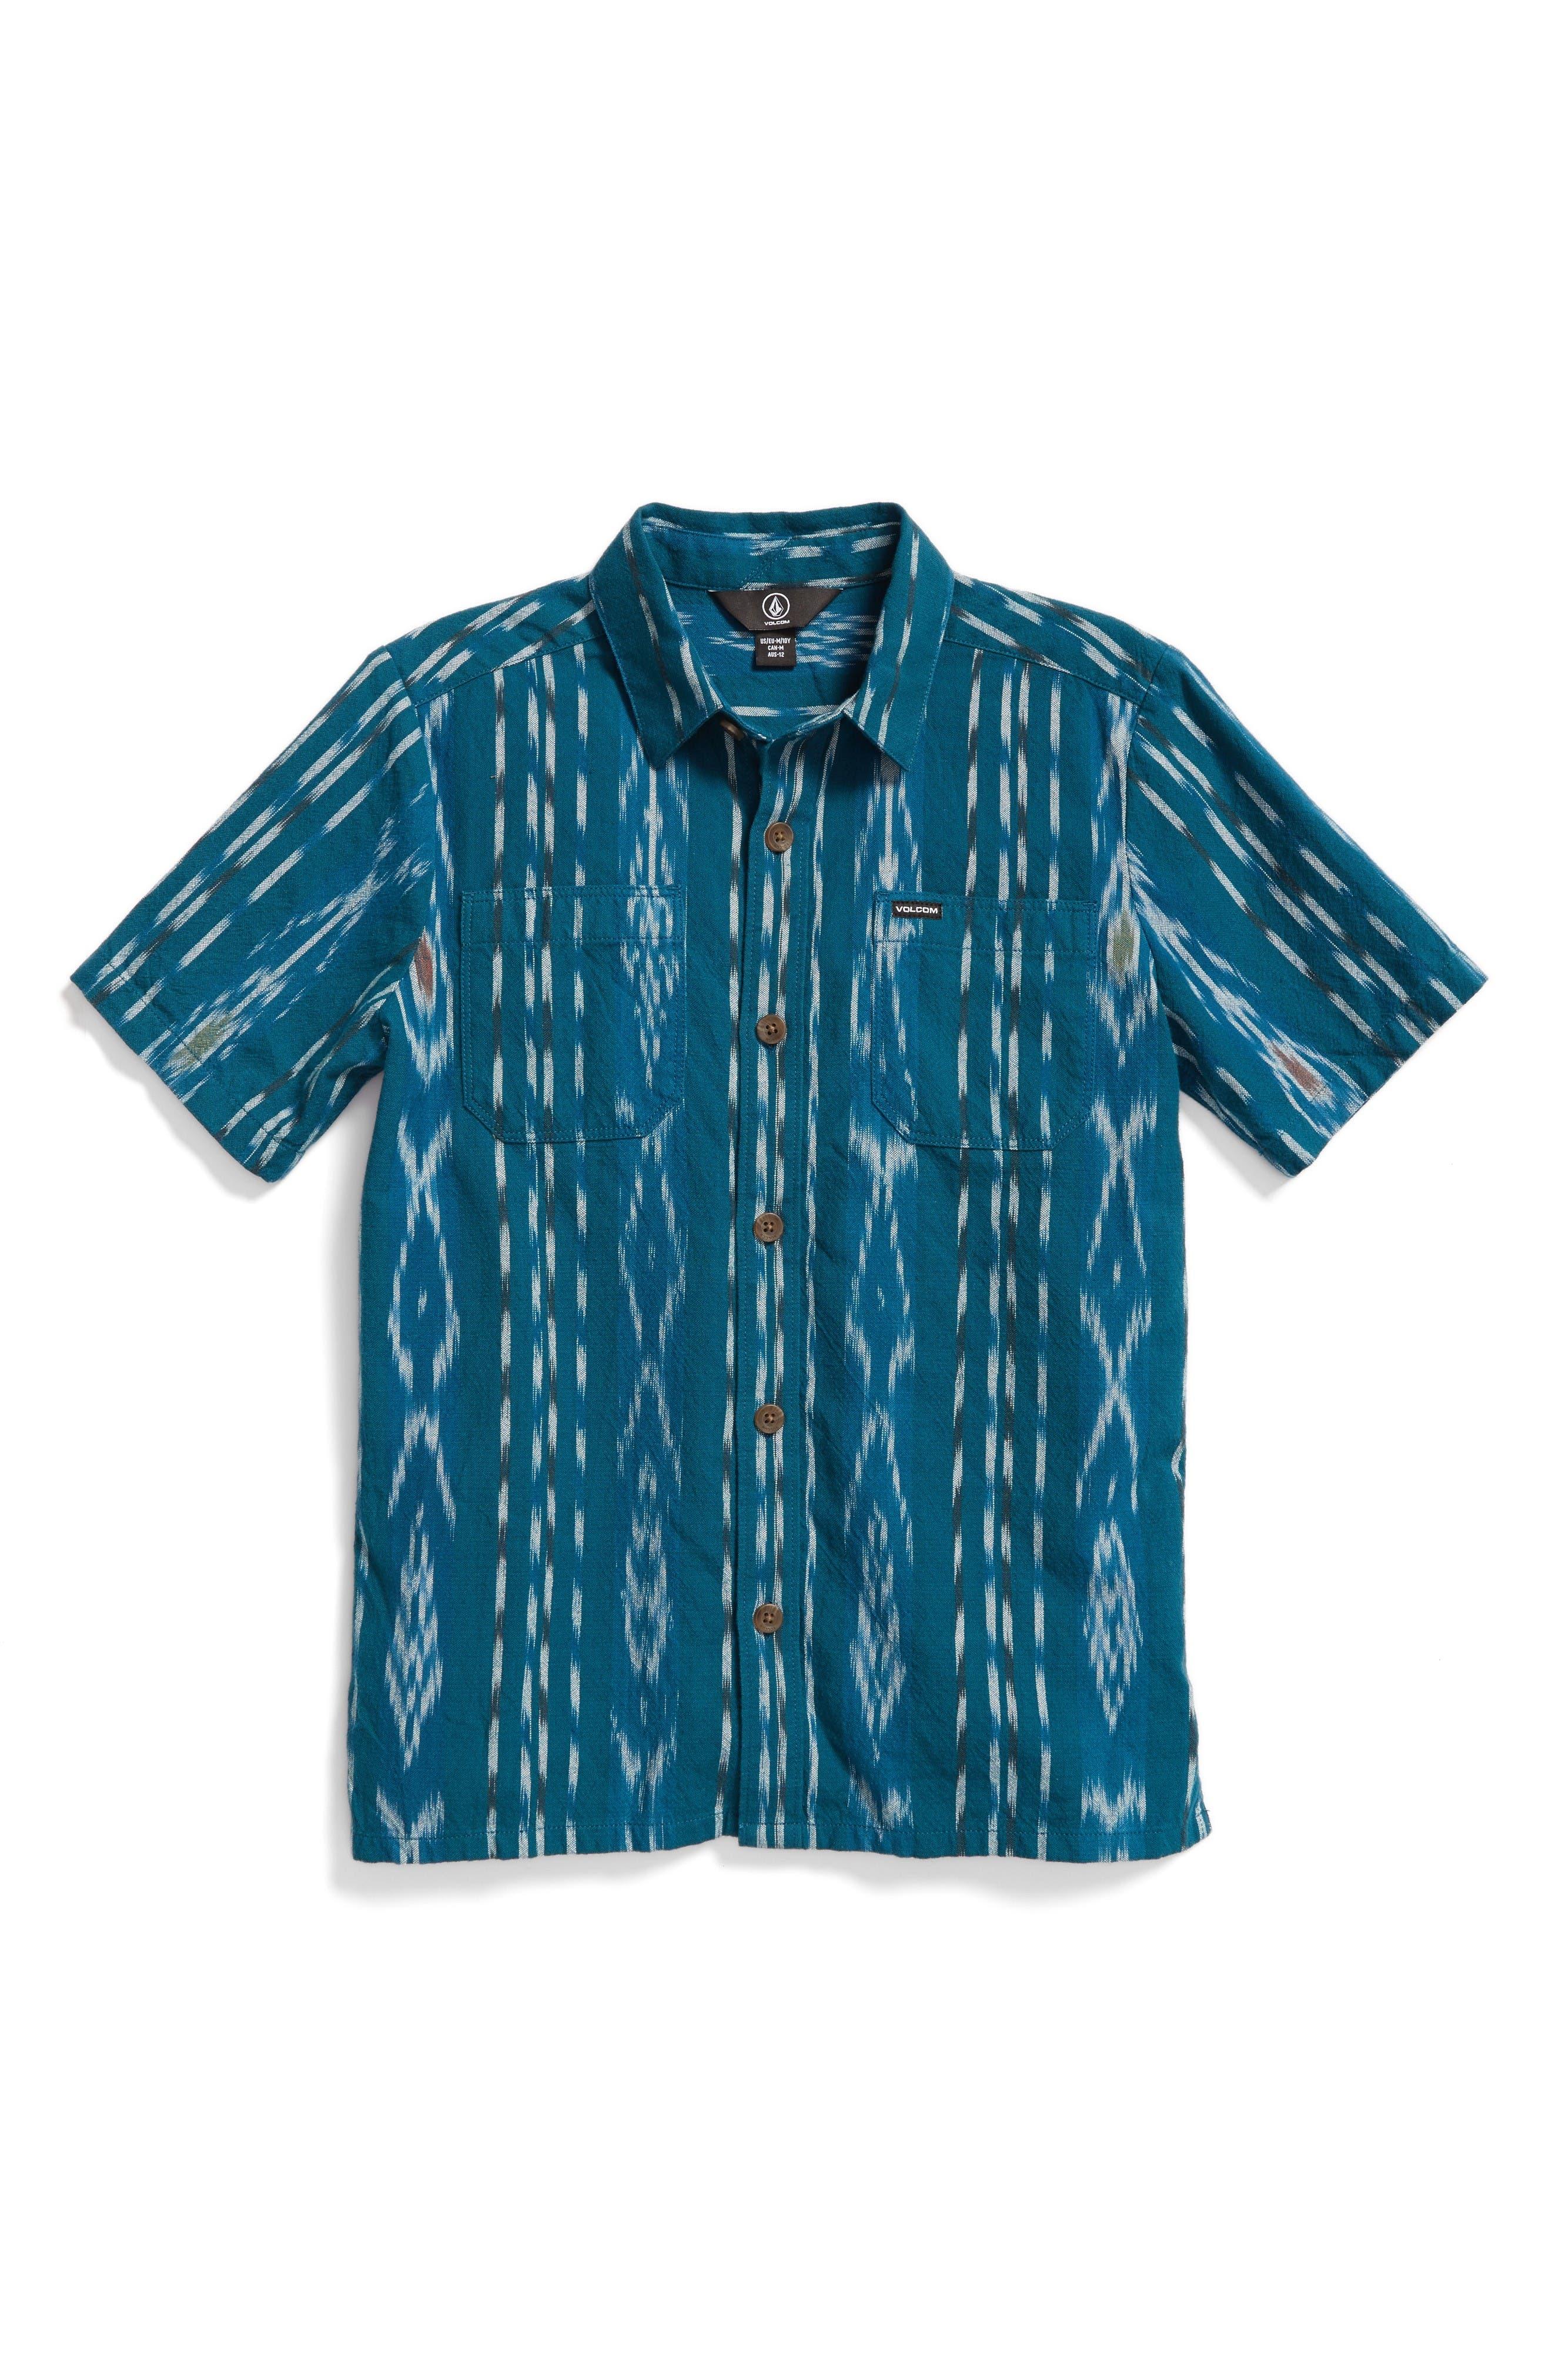 Volcom Slogan Print Woven Shirt (Big Boys)